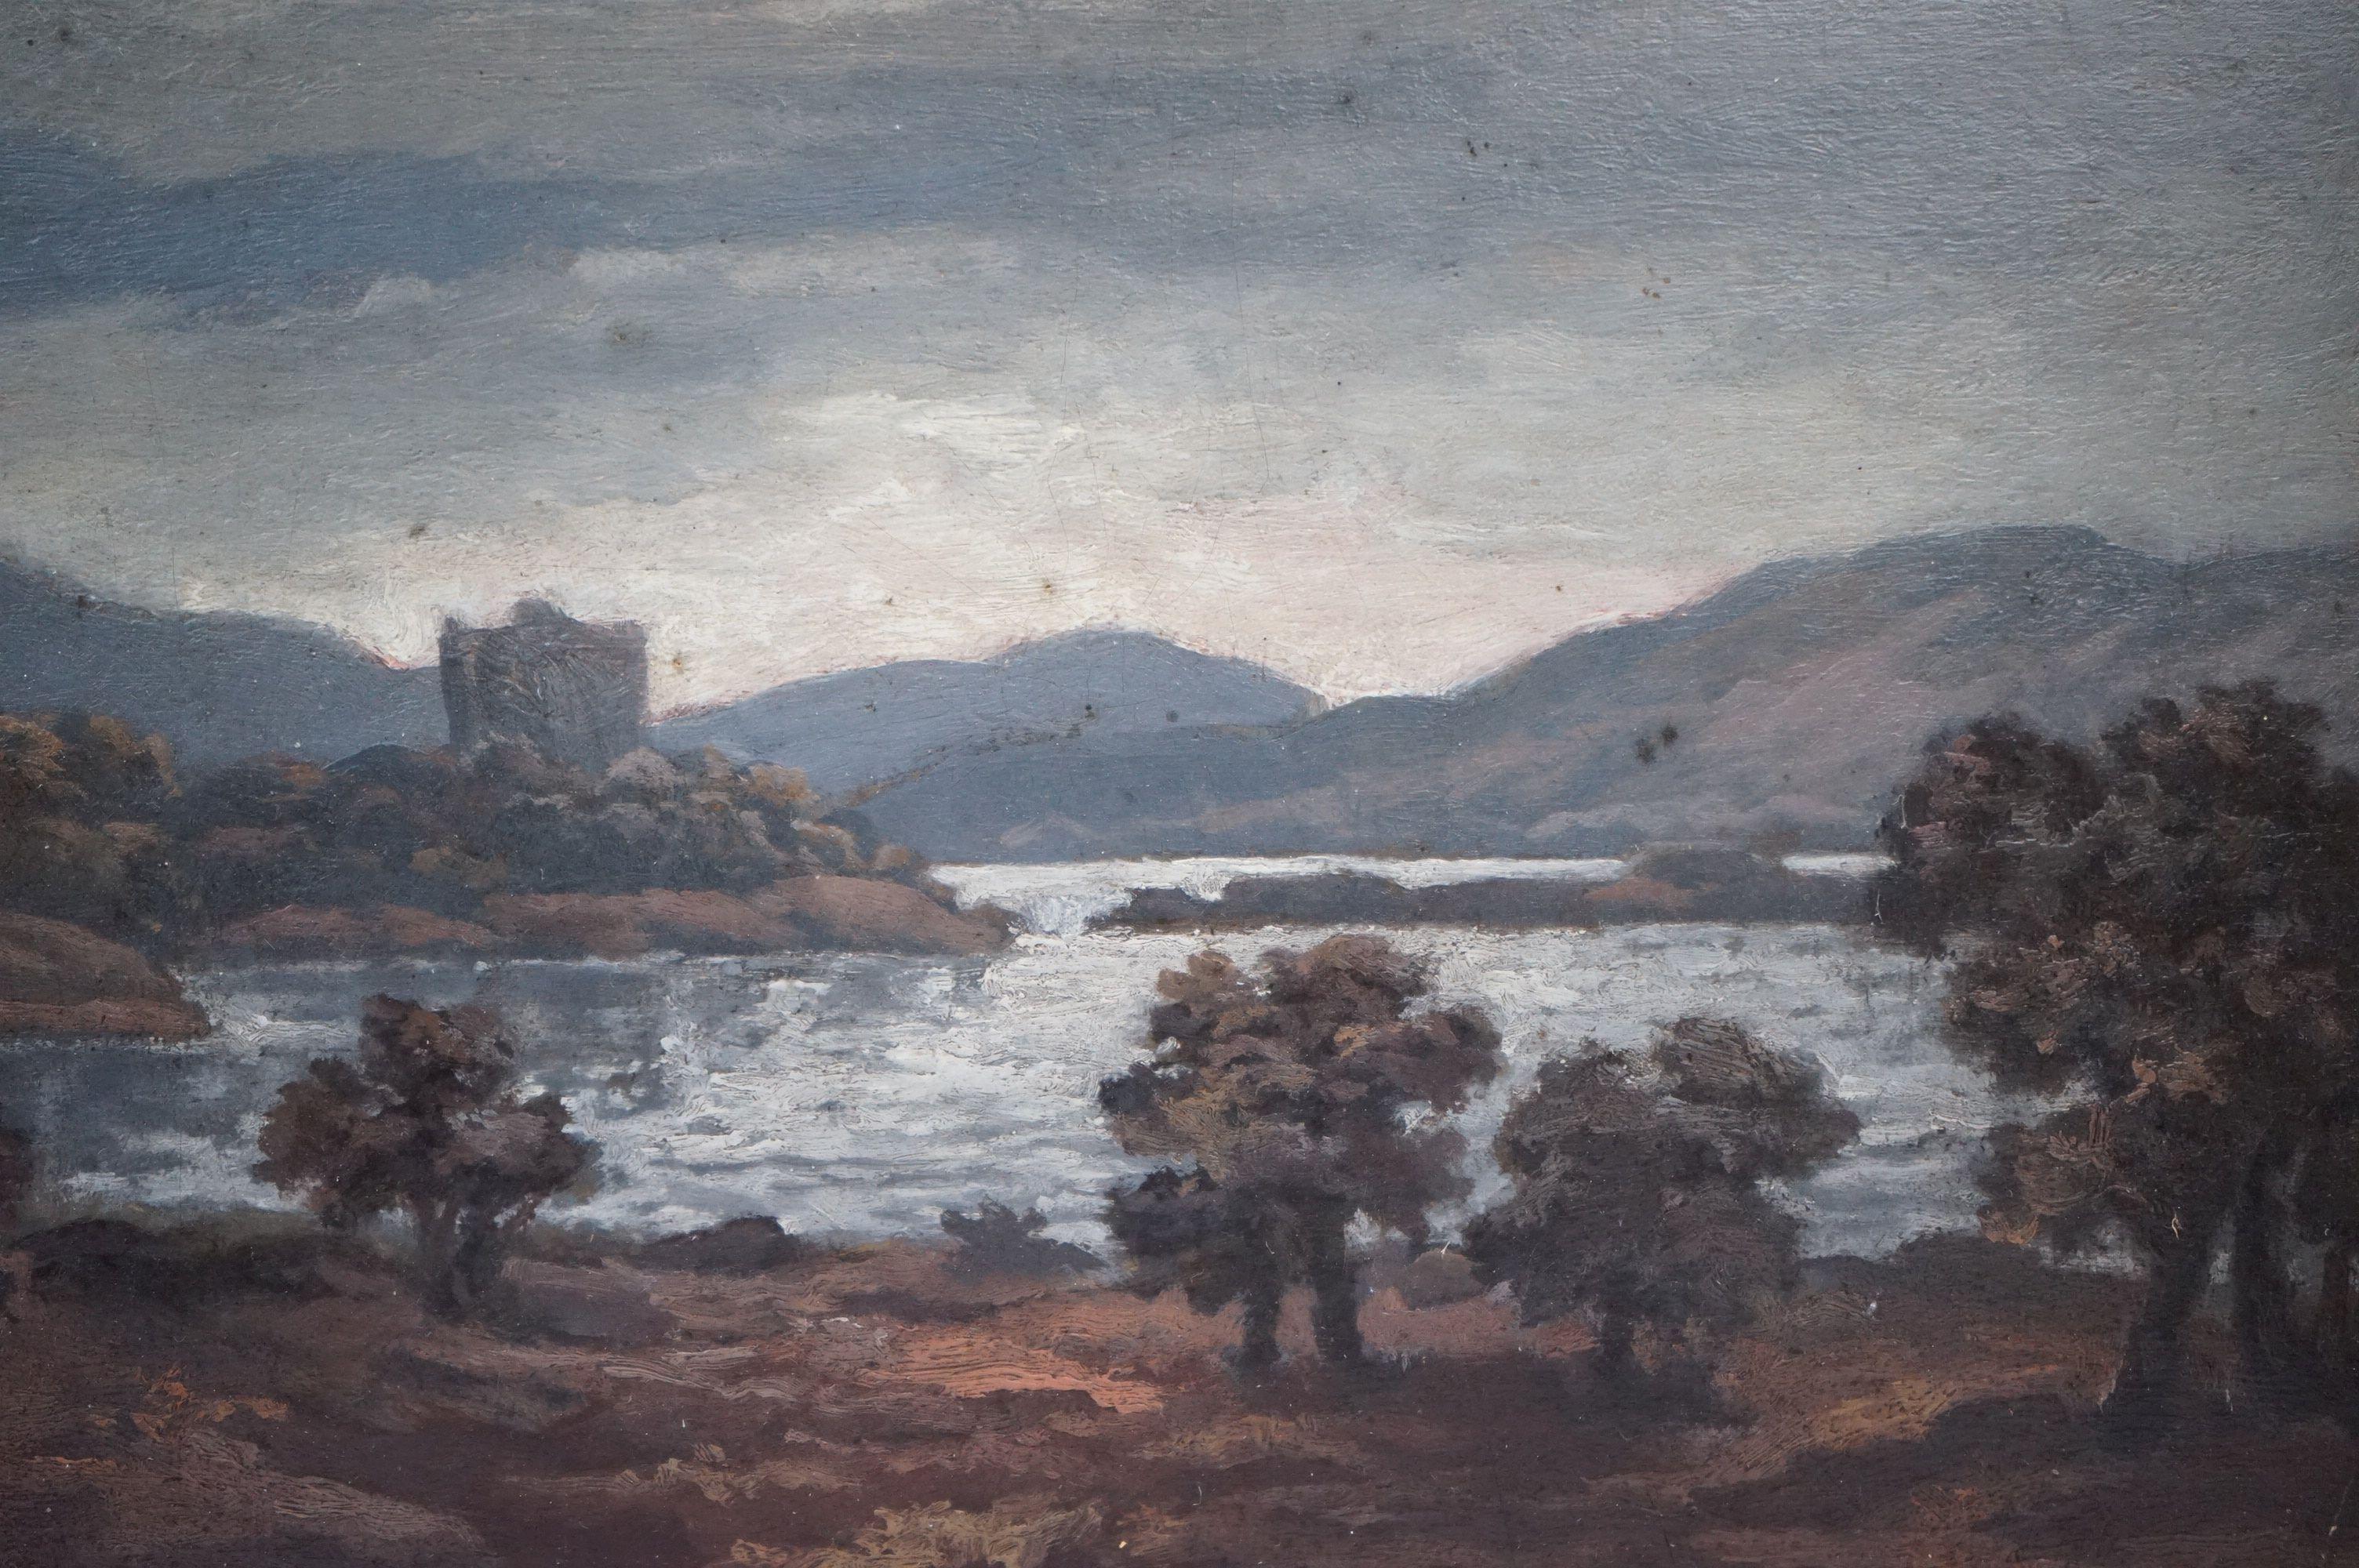 Oil Painting on Board of a Lakeland Scene Landscape, 25cms x 18cms, gilt framed - Image 3 of 4